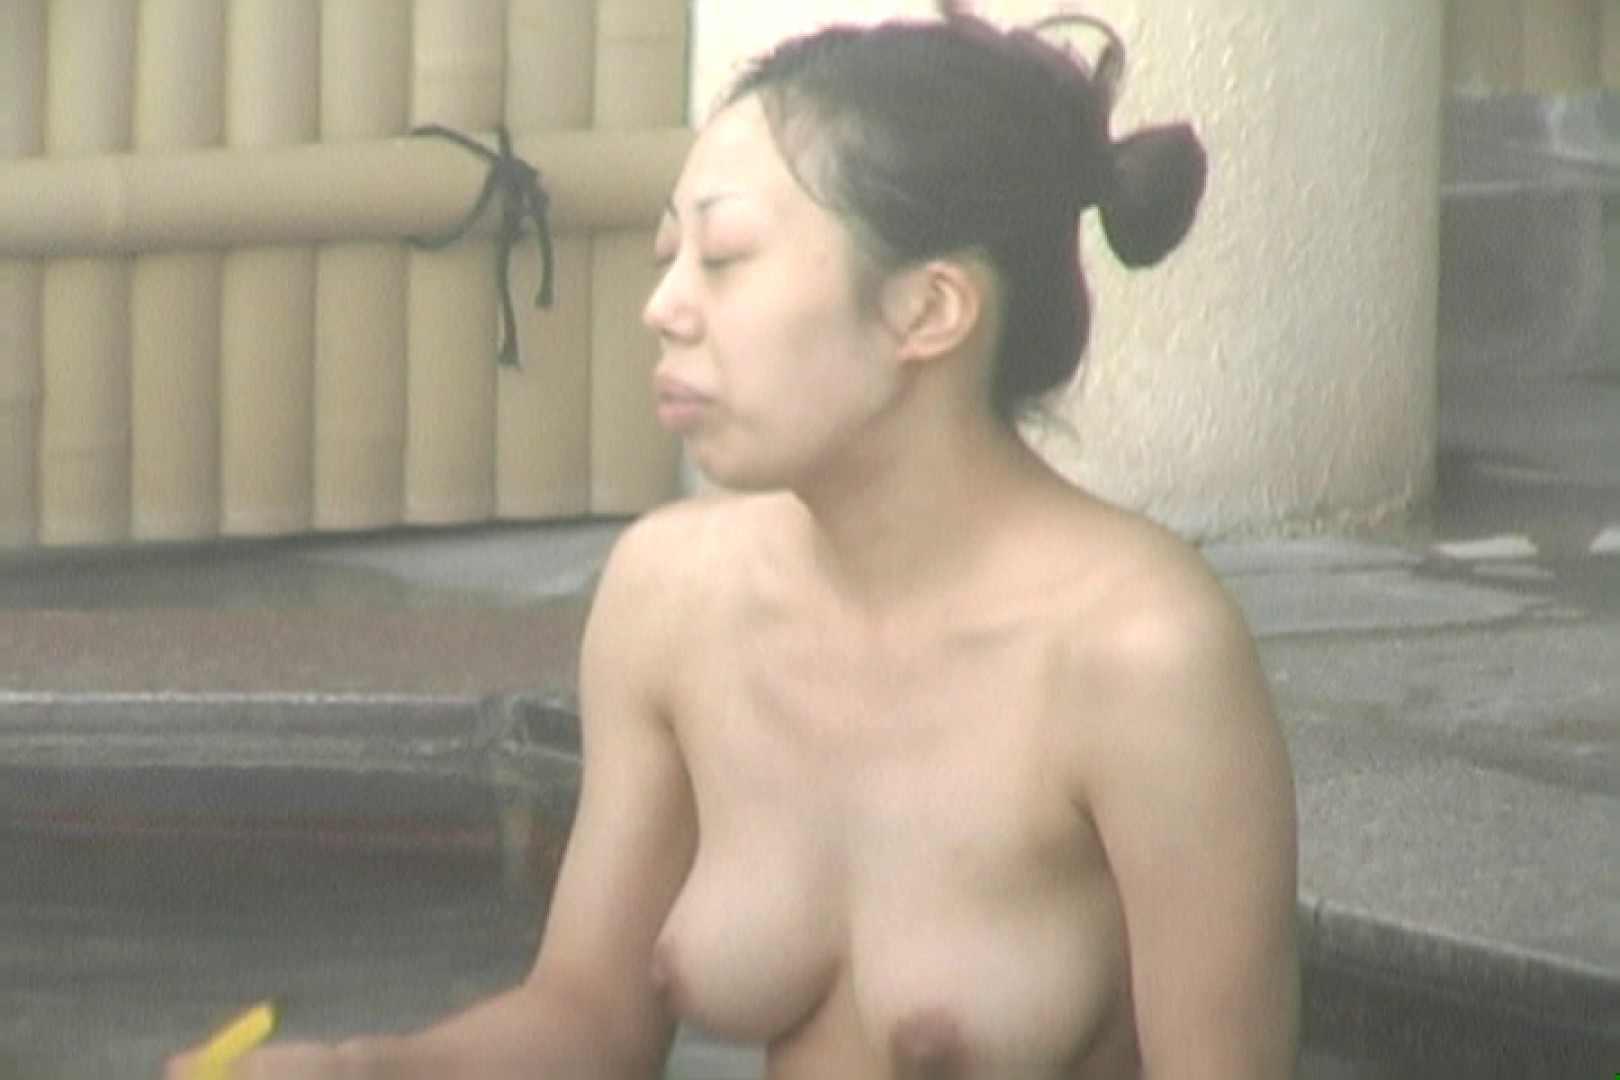 Aquaな露天風呂Vol.626 OLセックス | 盗撮  92画像 1